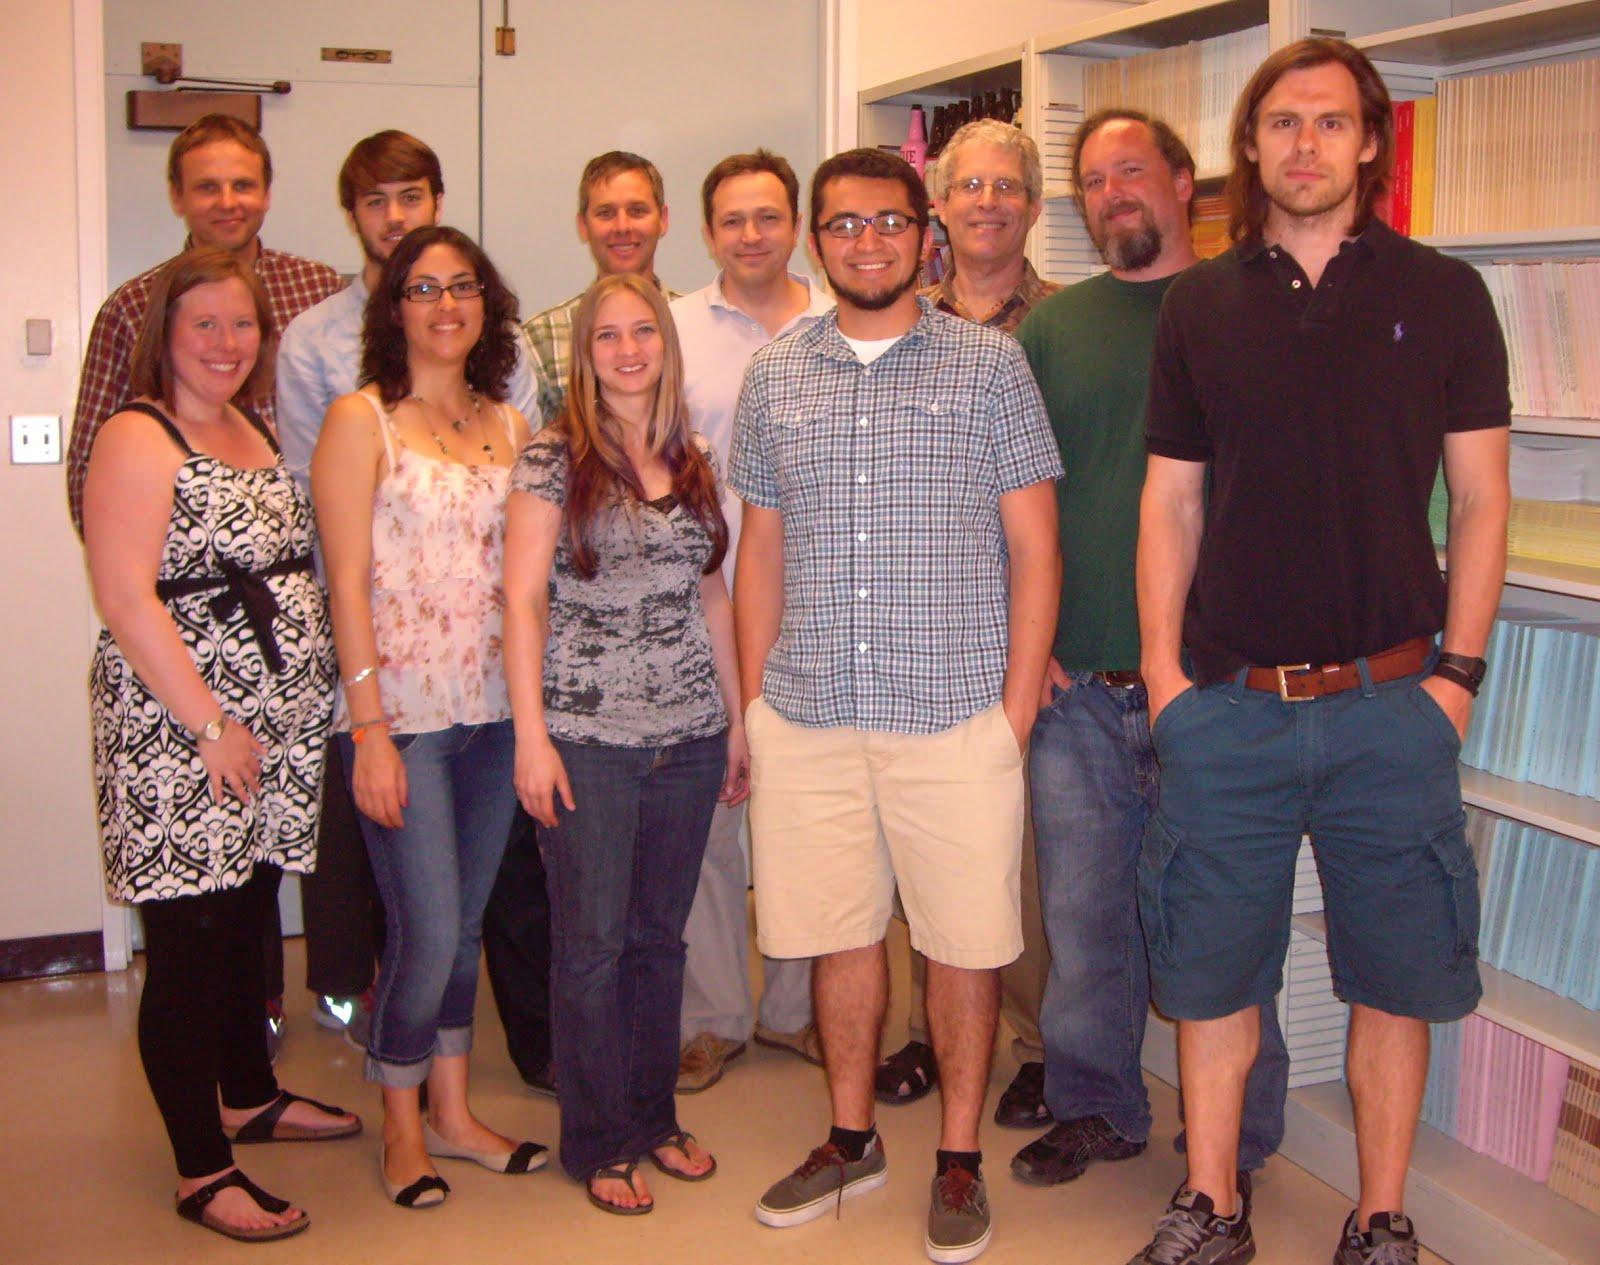 imgp2530-mangelresearchgroup-1